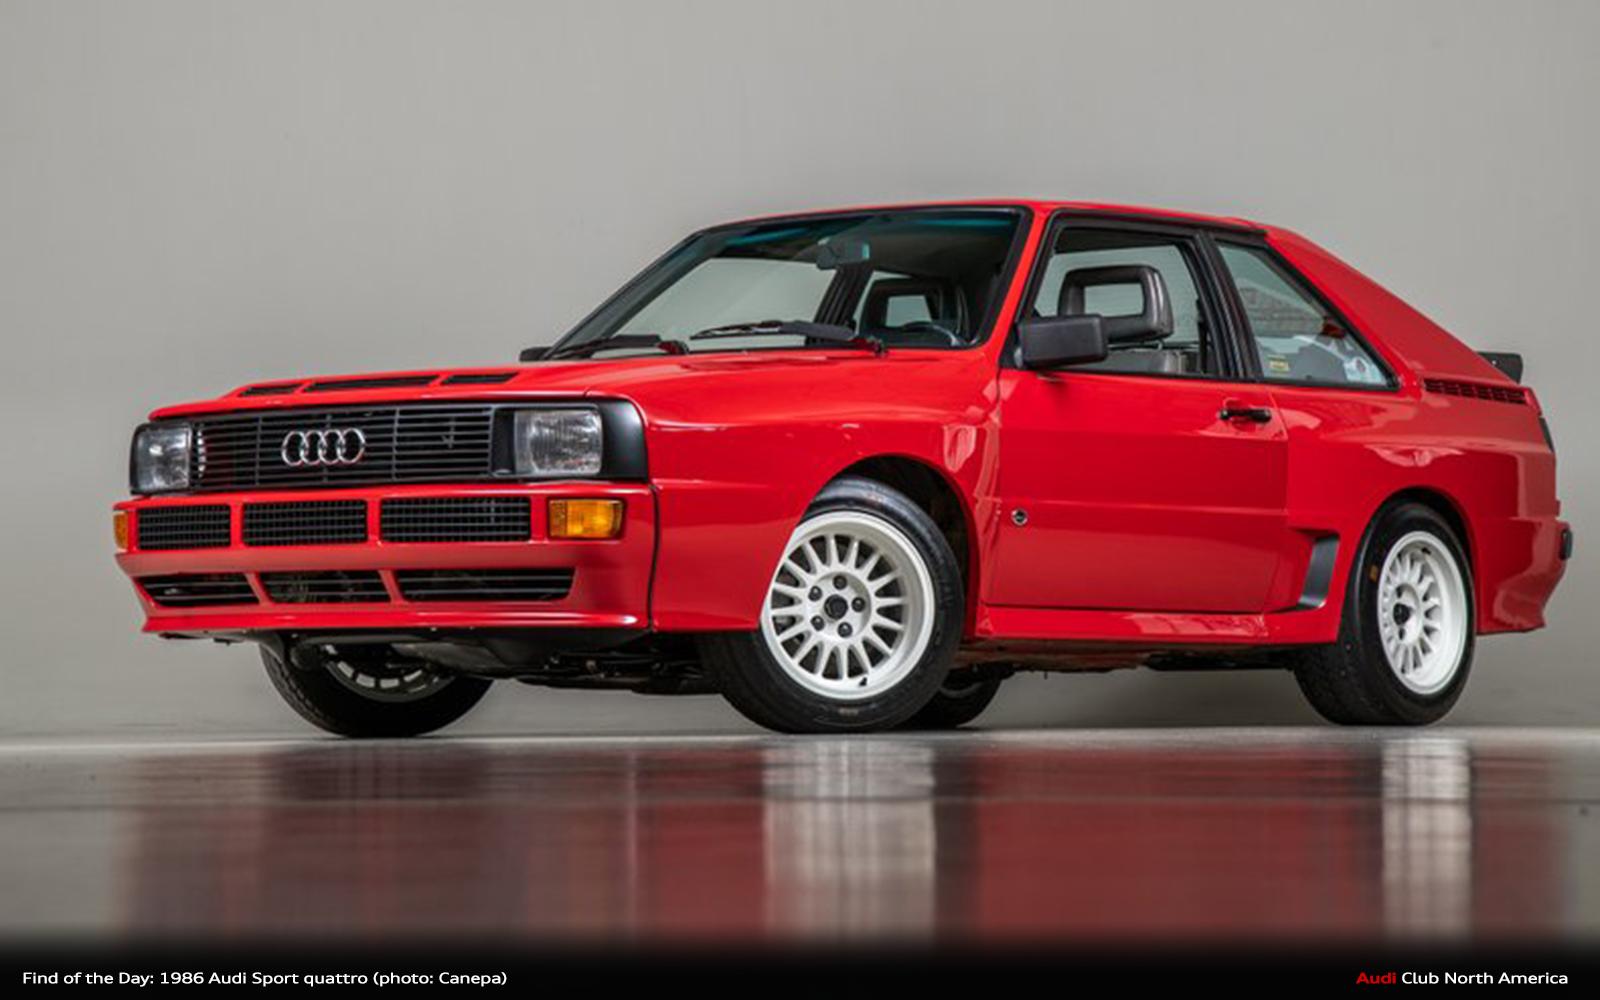 Audi Sport Quattro >> Find Of The Day 1986 Audi Sport Quattro Audi Club North